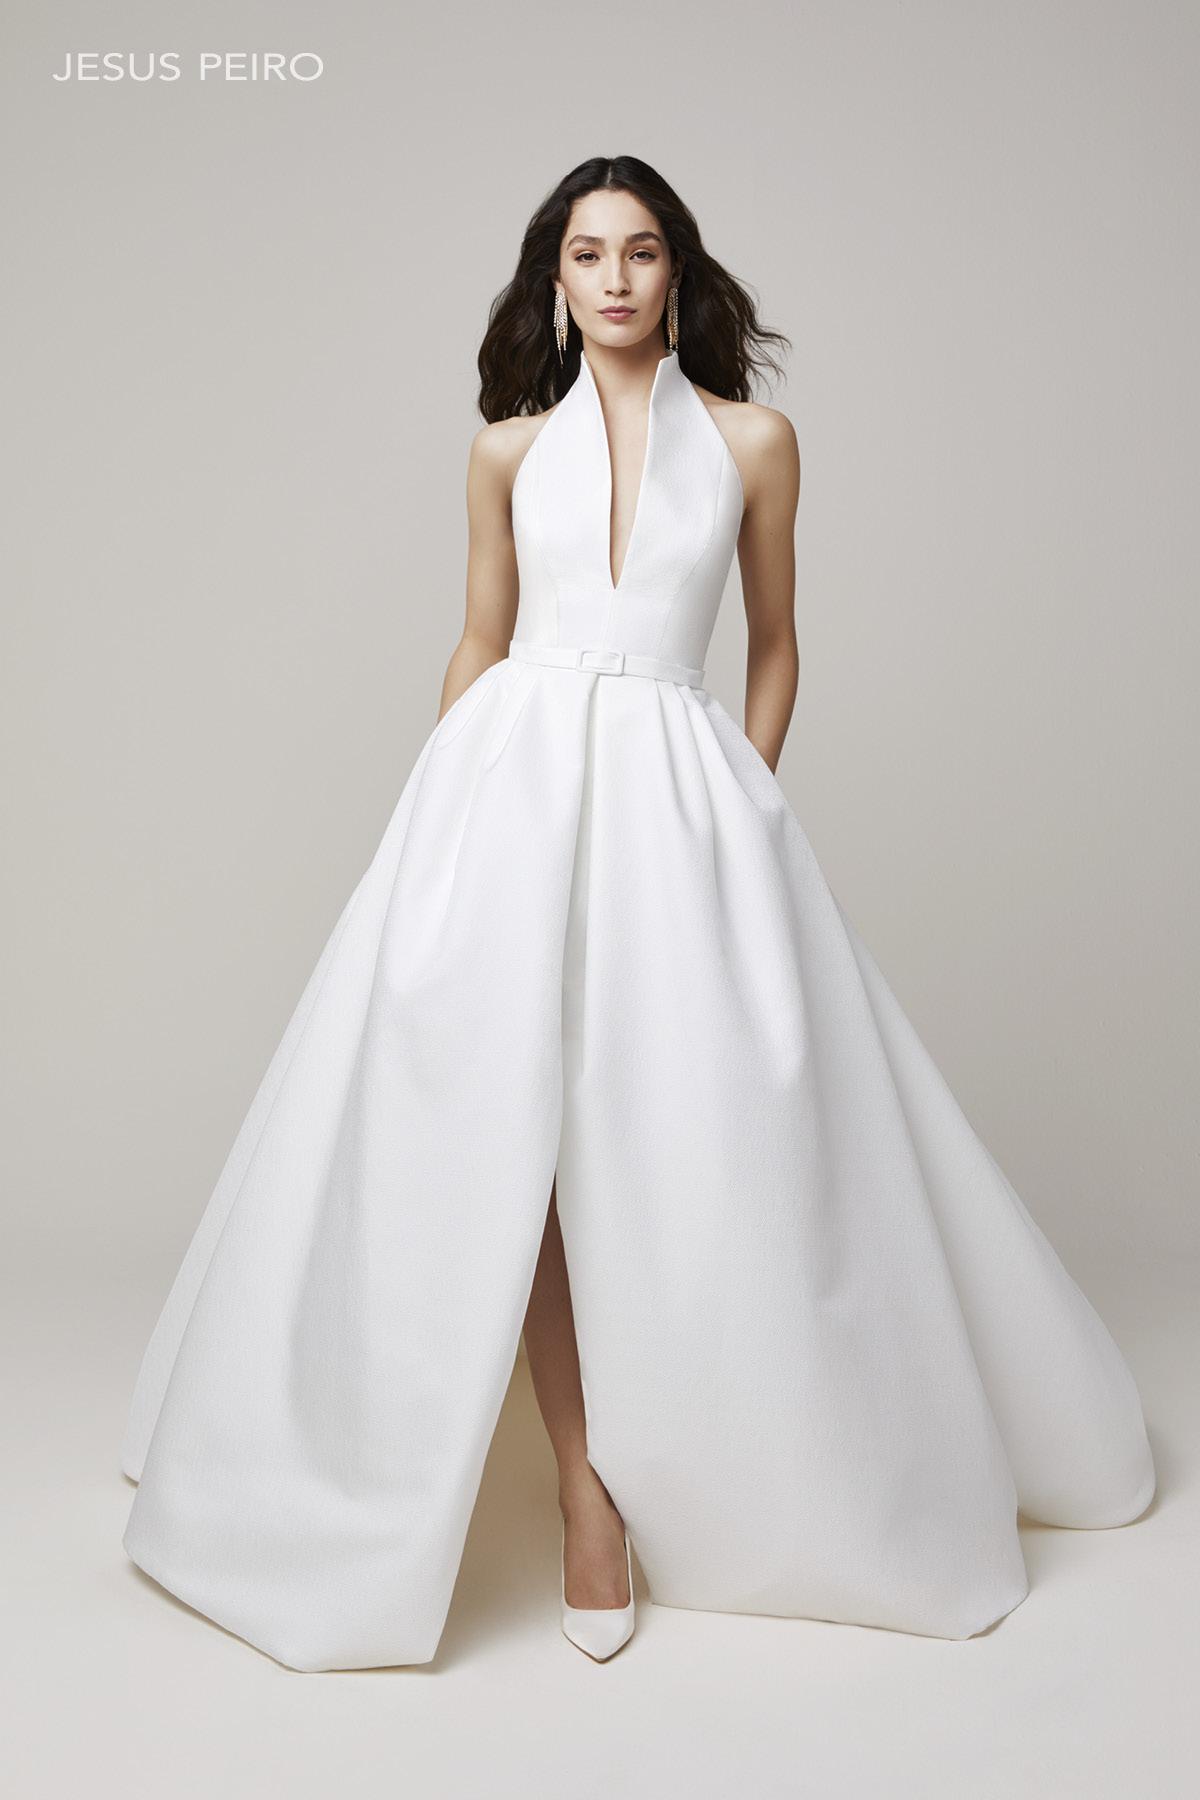 Vestido novia Jesús Peiró Ref.2242